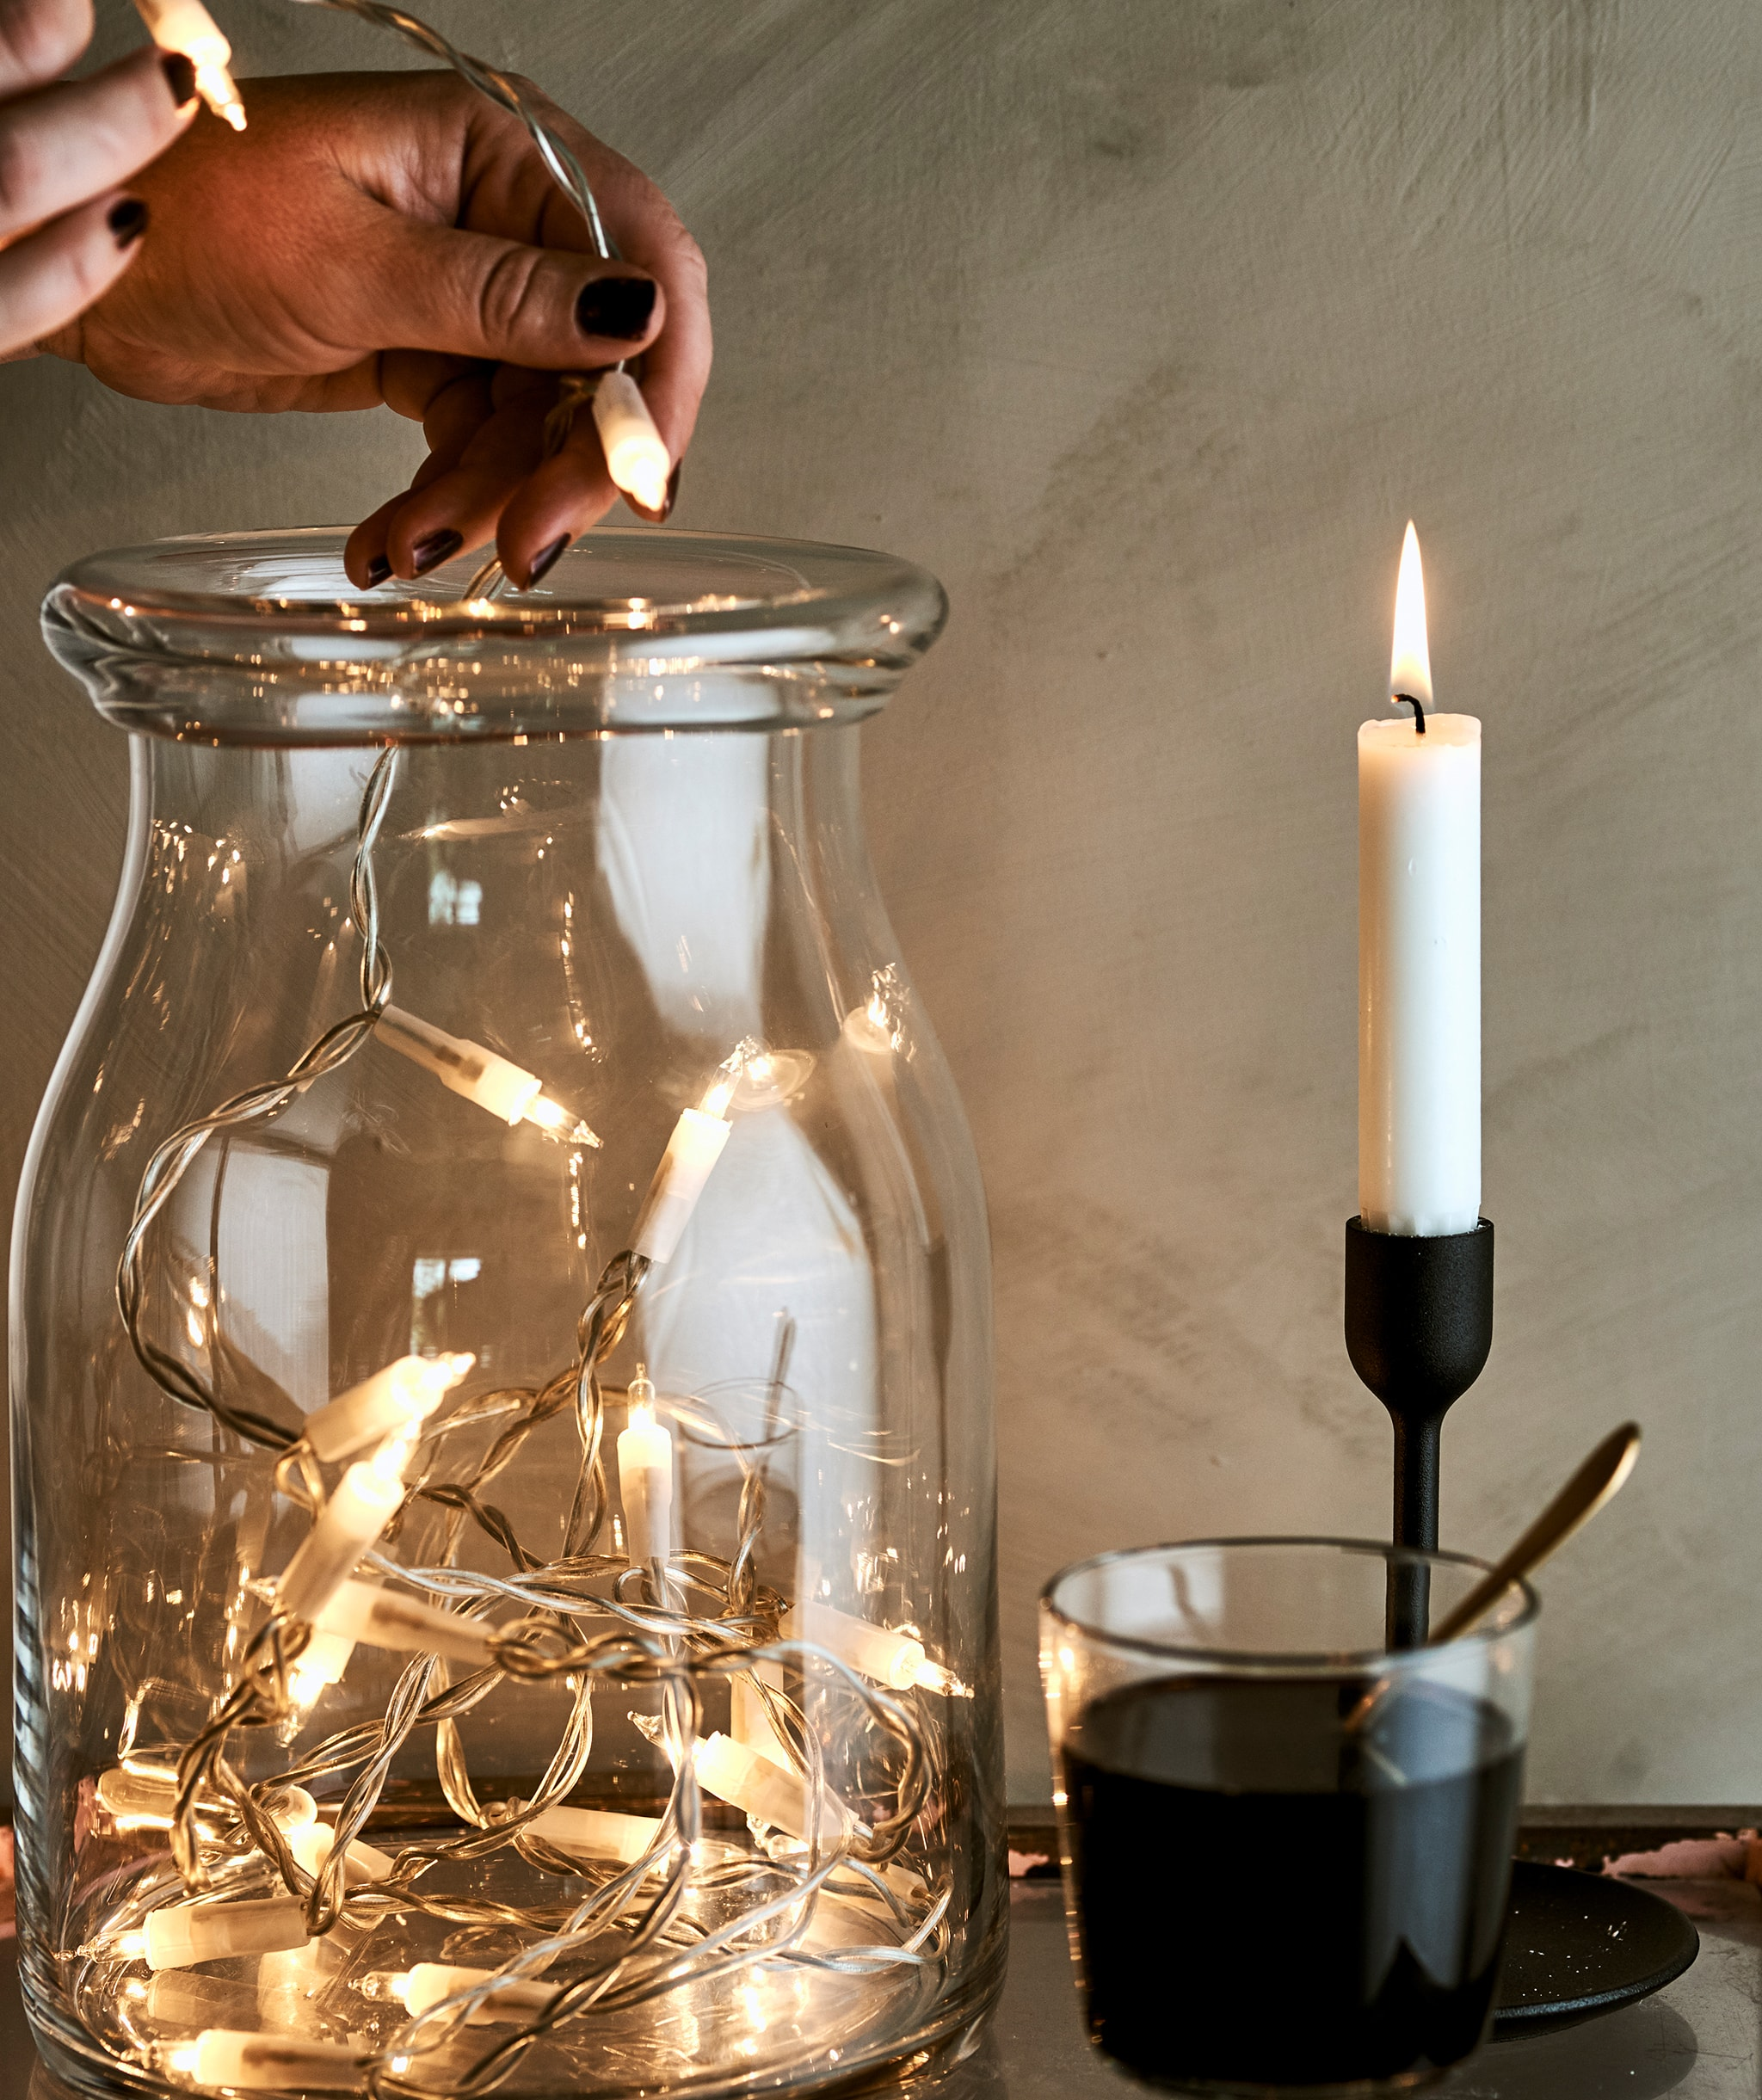 Seorang wanita mengisi stoples kaca dengan lampu dekoratif di sebelah segelas minuman anggur dan menyalakan lilin dalam tempat lilin berwarna hitam.